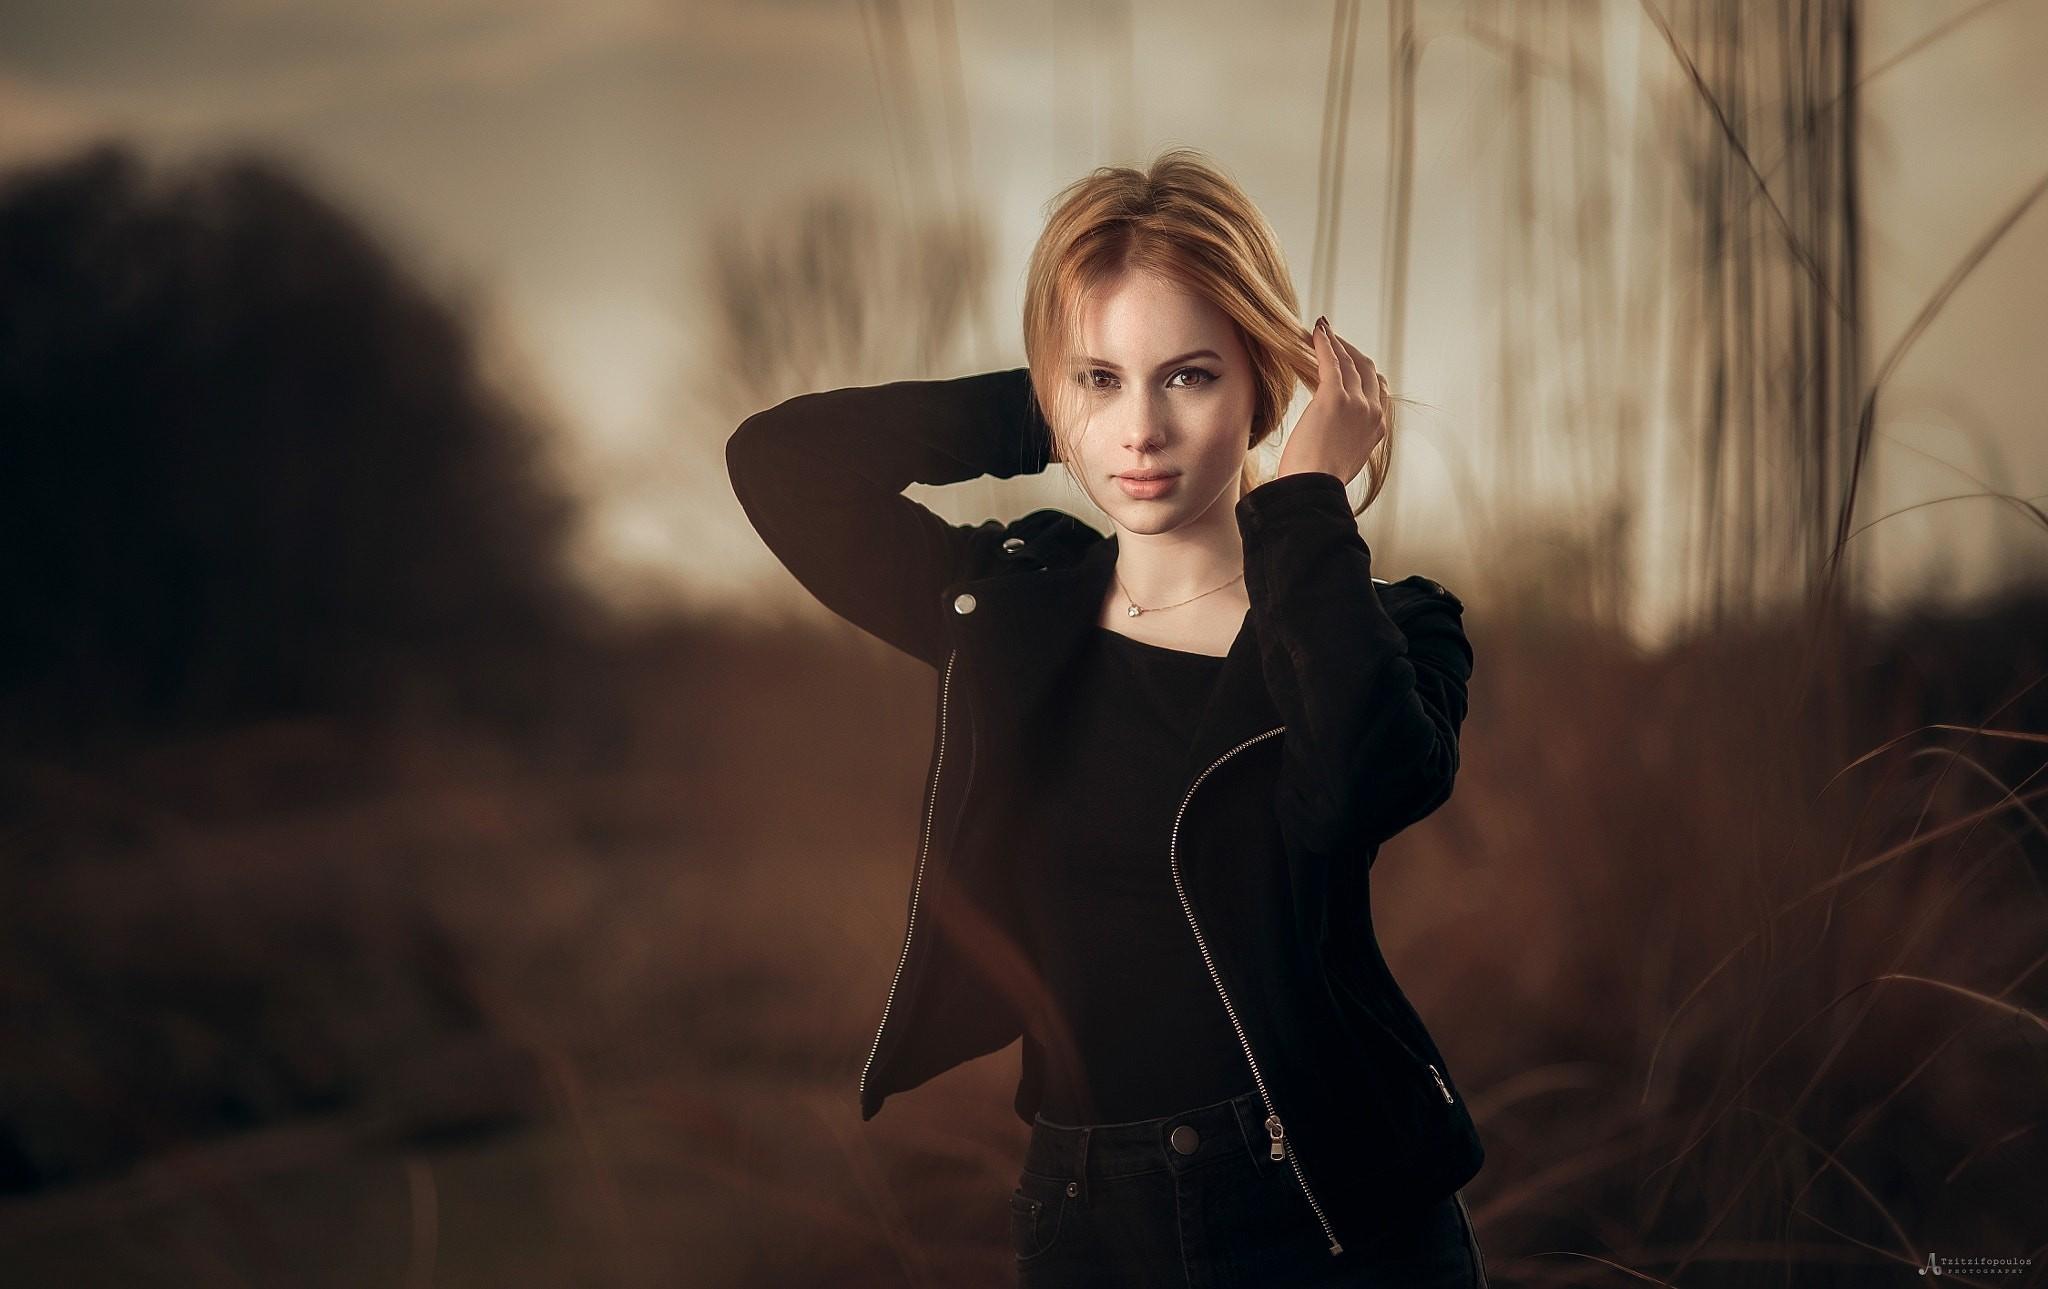 People 2048x1289 women model looking at viewer blonde depth of field jacket Agelos Tzitzifopoulos black jackets